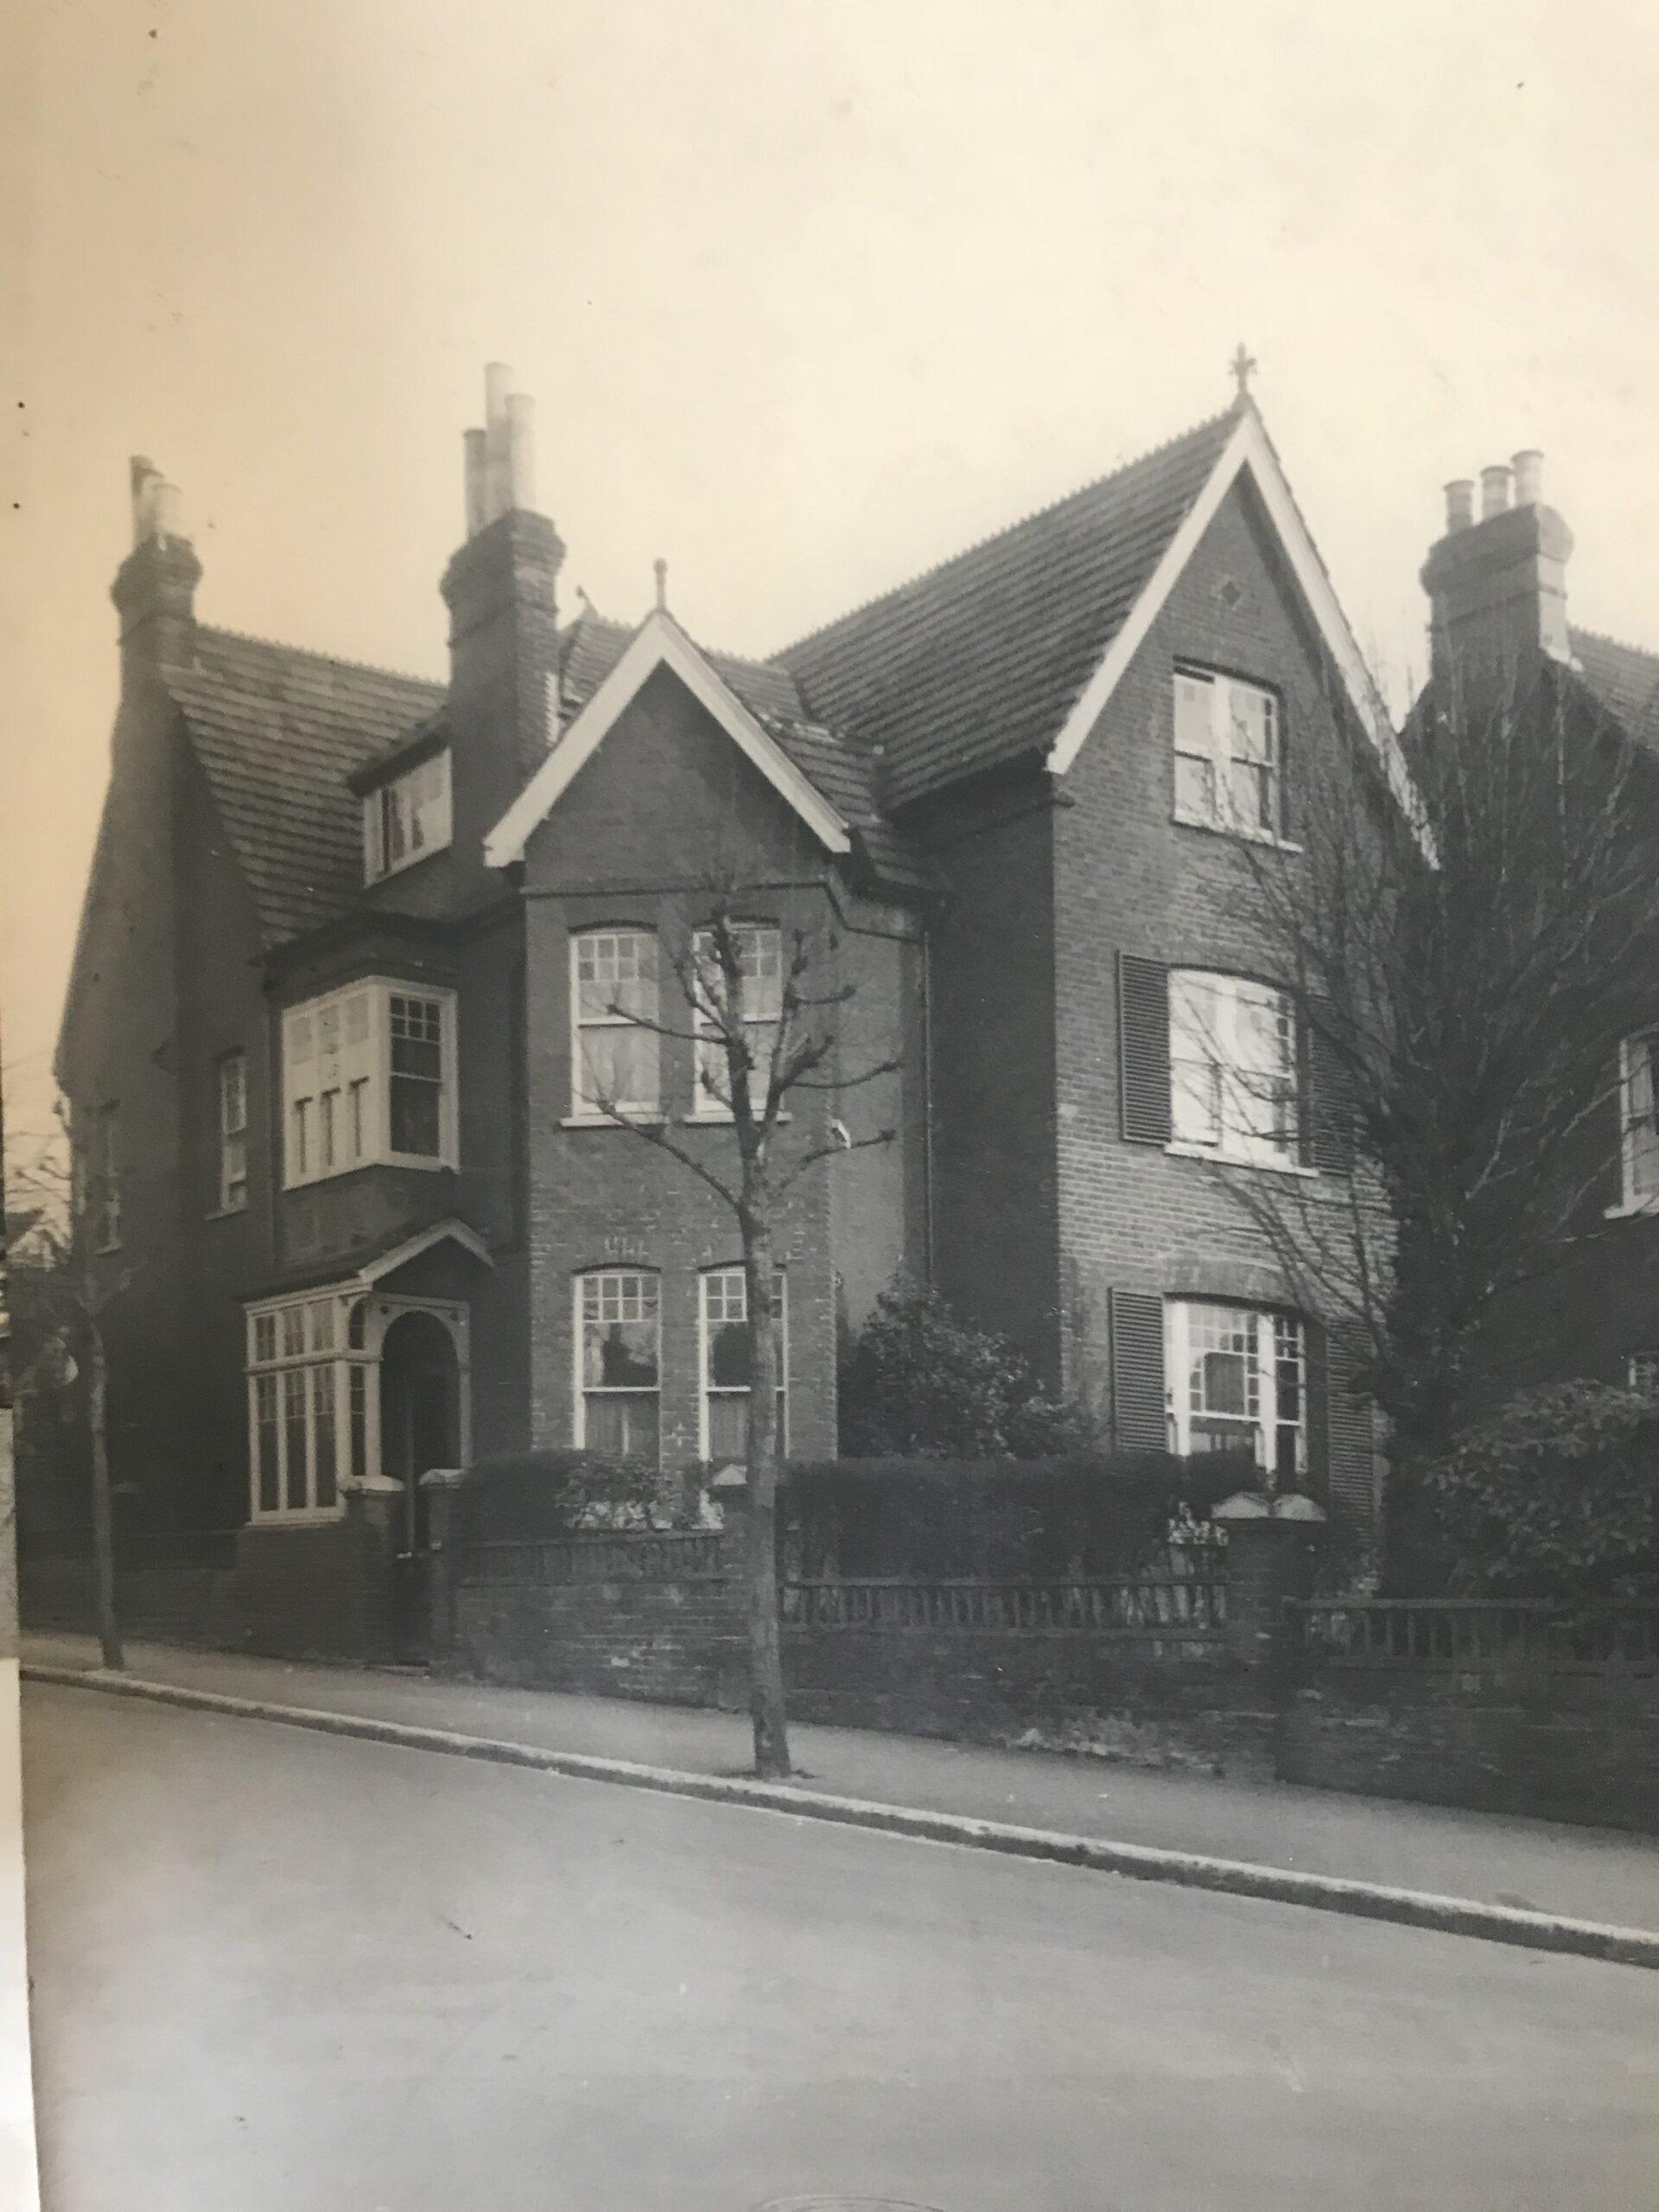 It all began at 107 Brighton Road